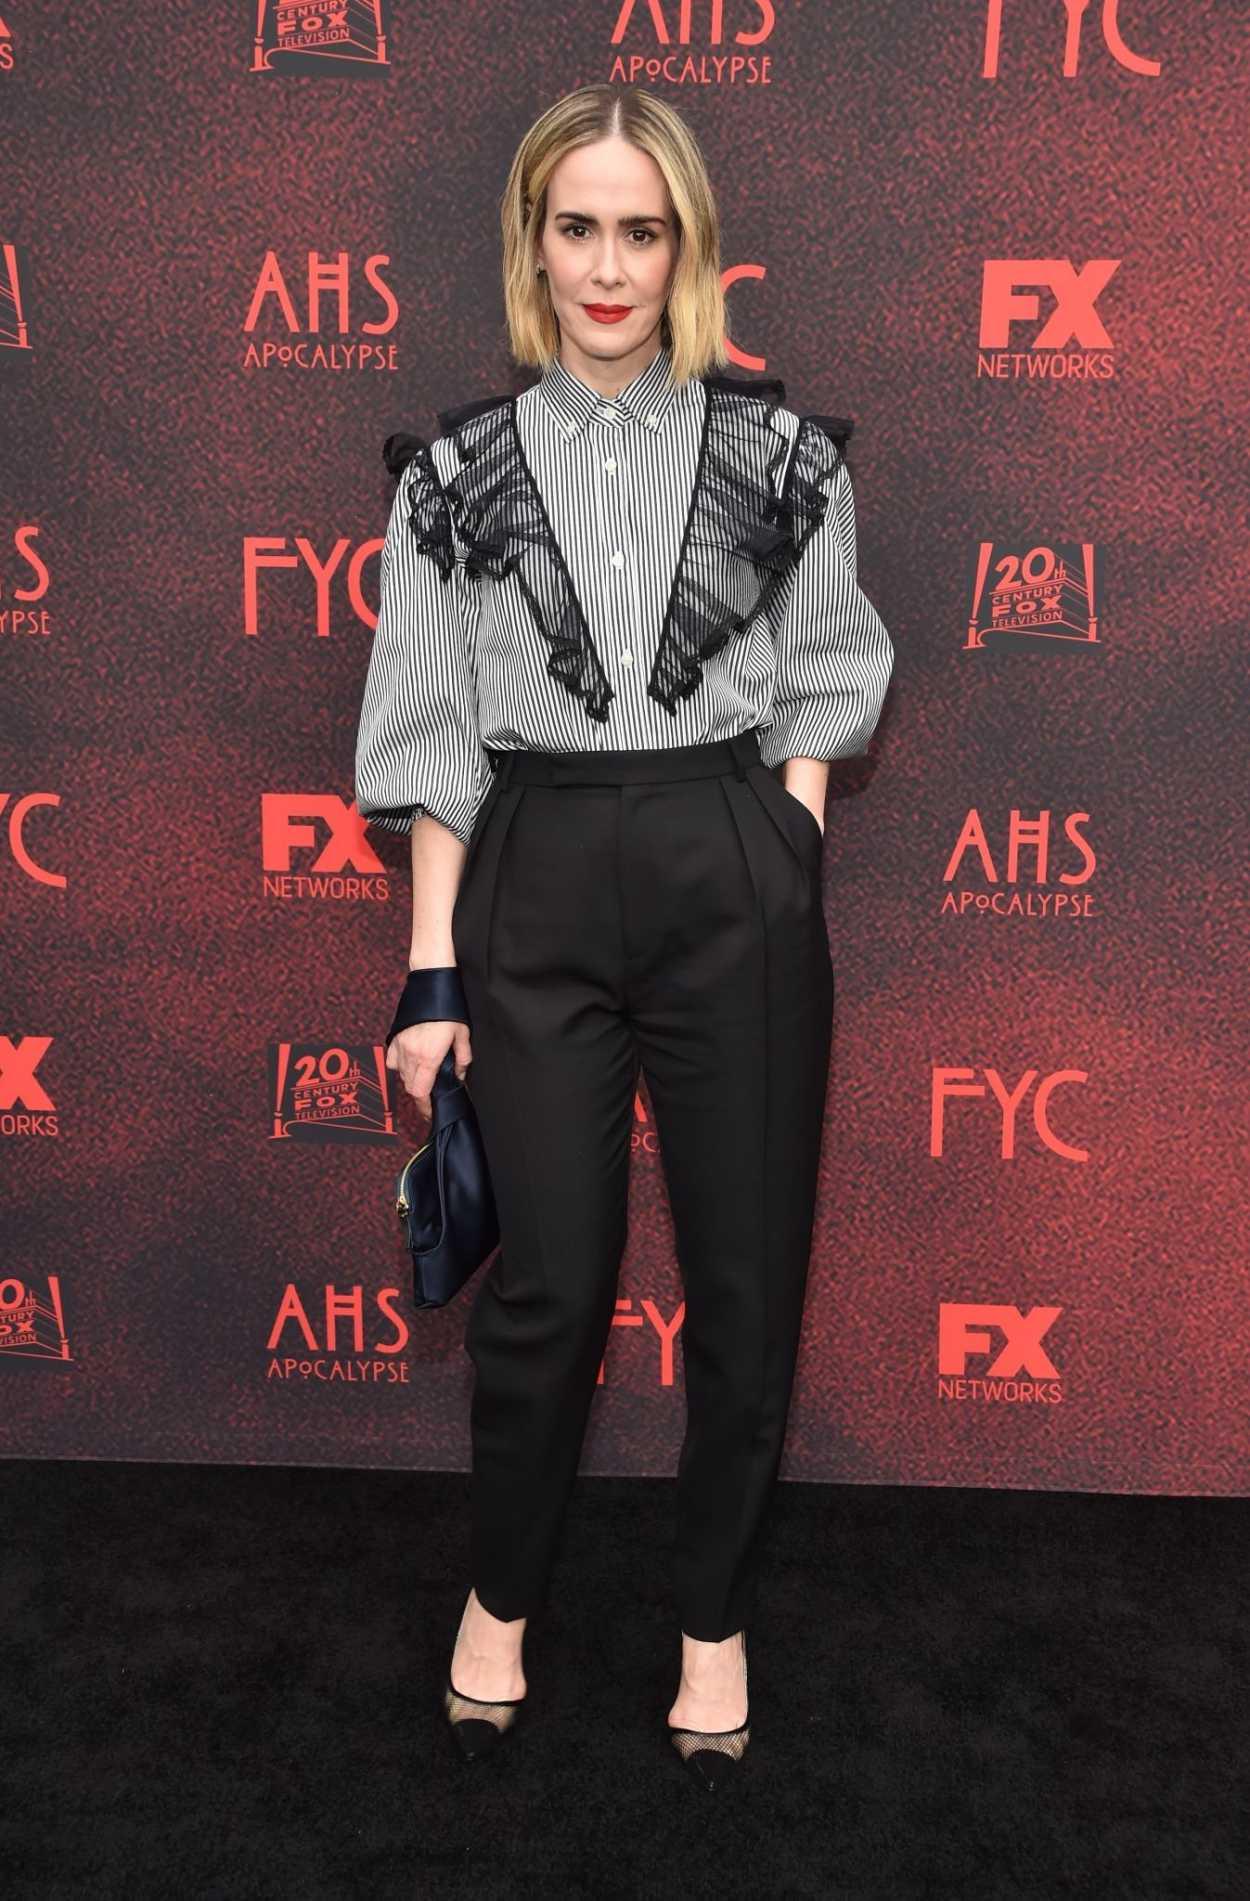 American Horror Story Apocalypse Premiere: Sarah Paulson